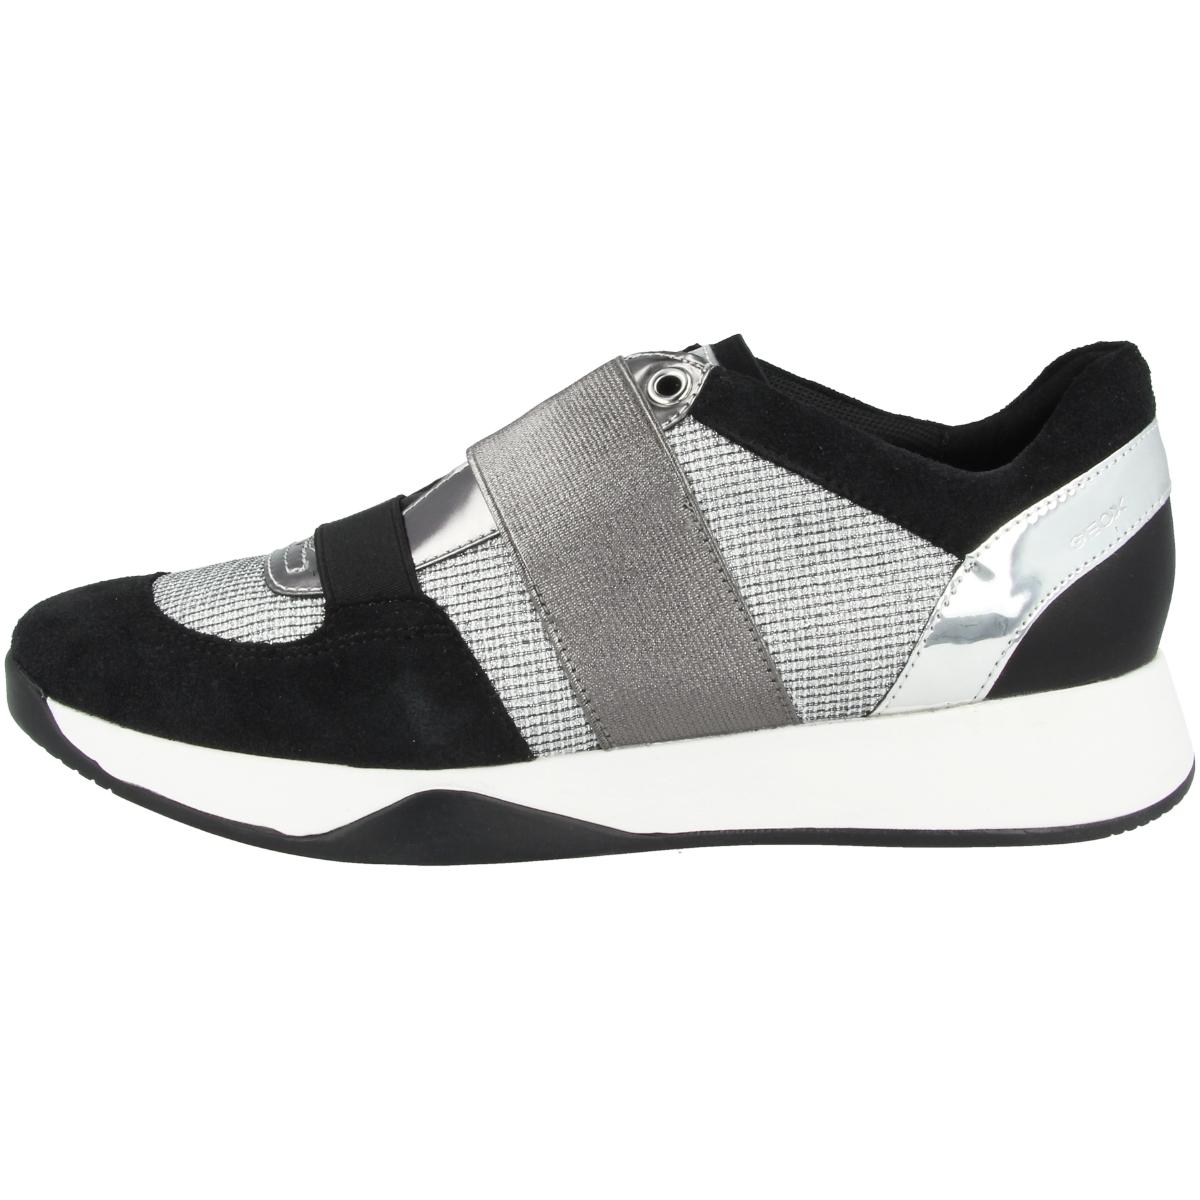 Geox D Suzzie D Chaussures Women Sneaker Femmes Loisirs Chaussures Basses d94frd0as22c0060